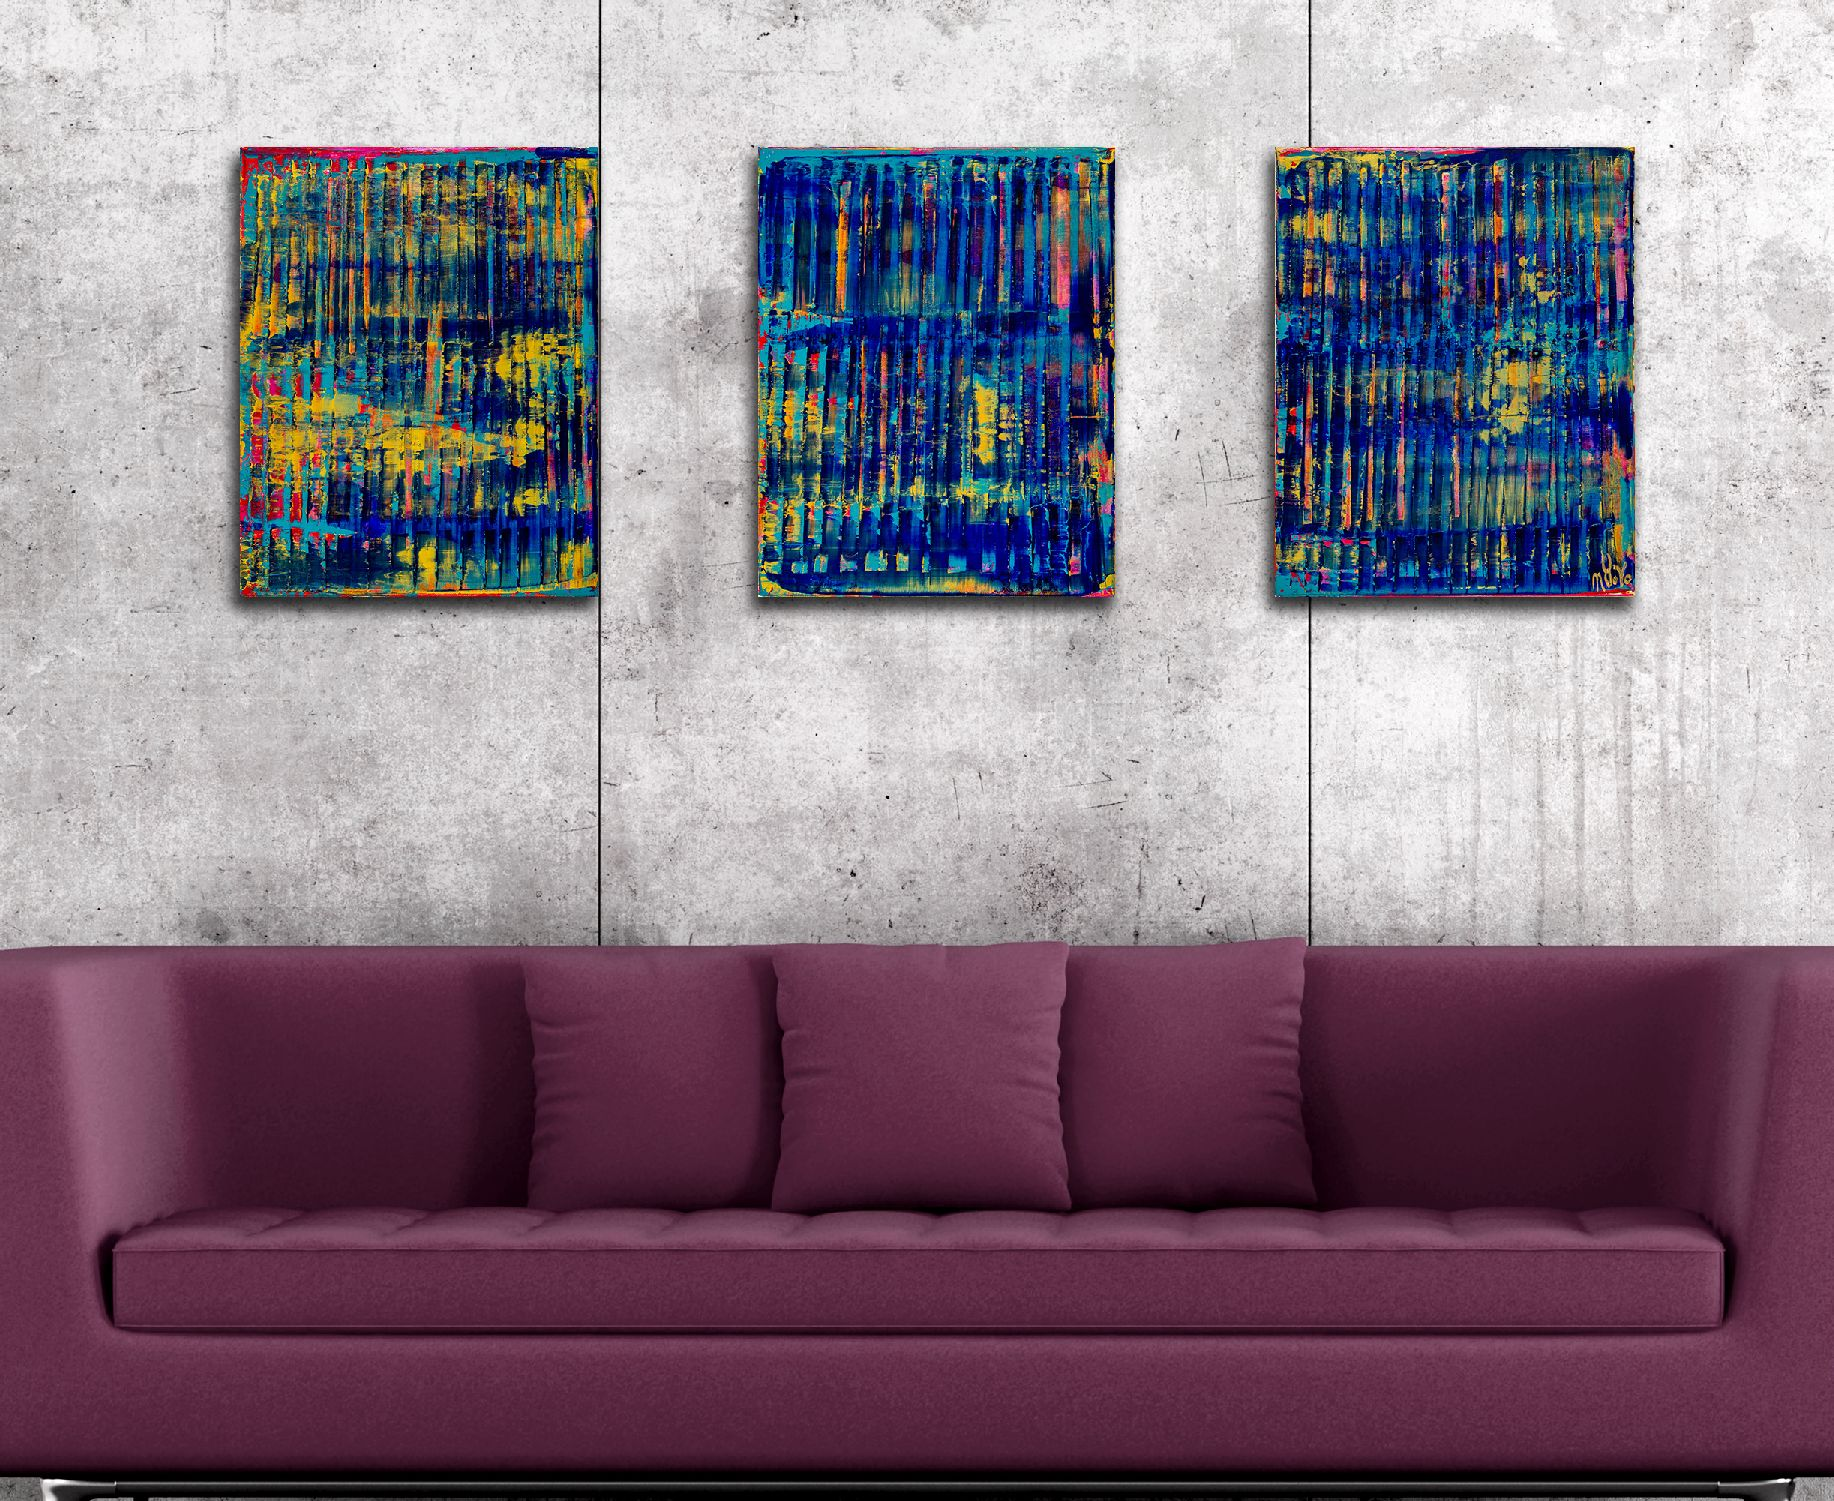 Room example / Breeze Intrusion (Gold Cracks) 2020 / Triptych by Nestor Toro